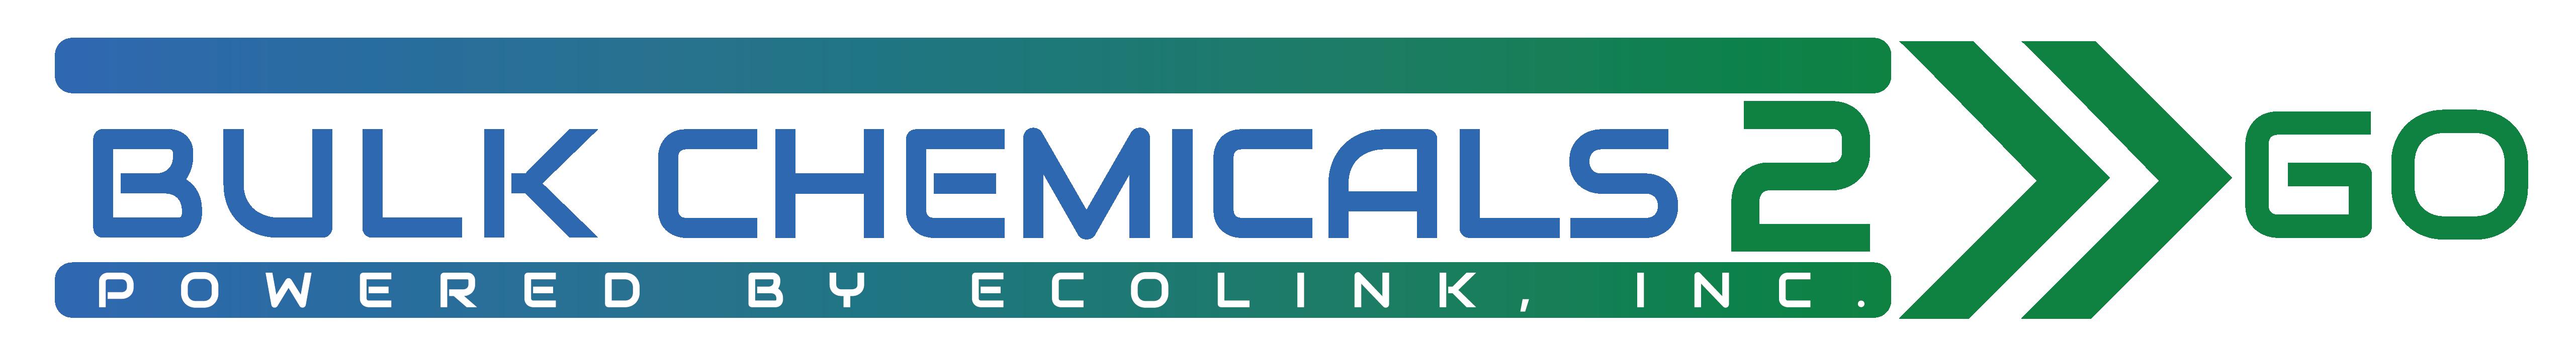 BulkChemicals 2go-logo